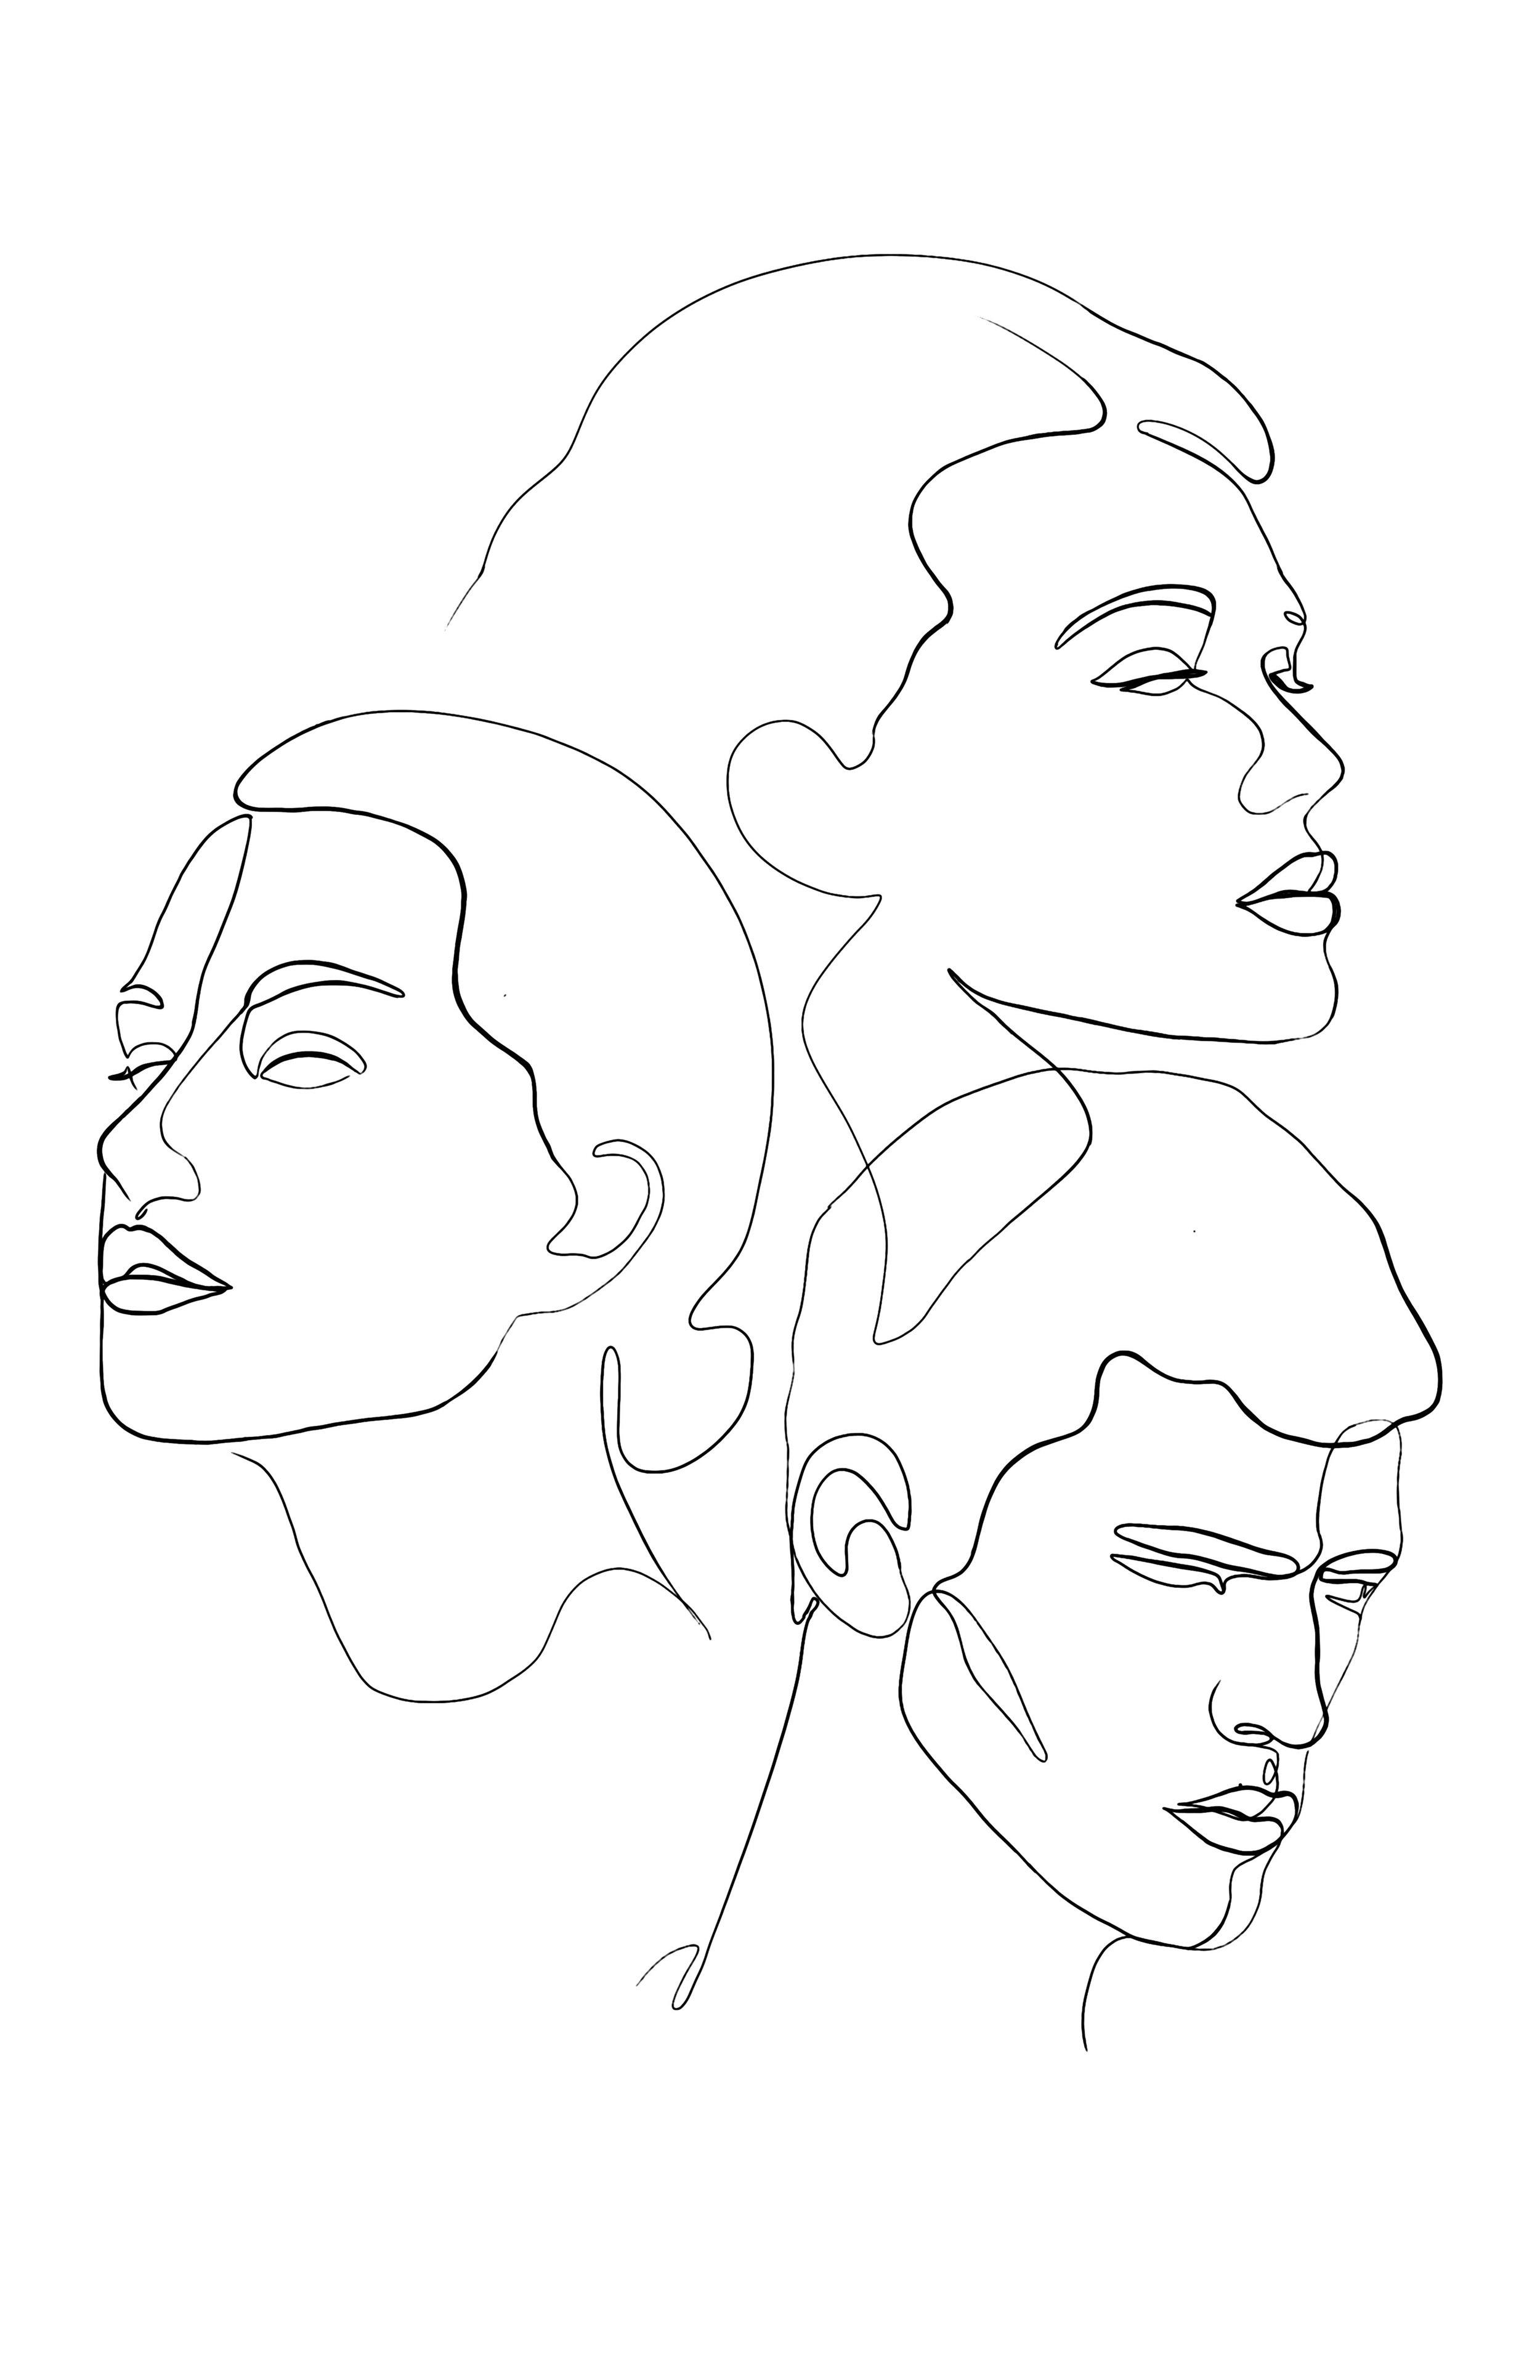 DrRomita_illustration_faces.jpg